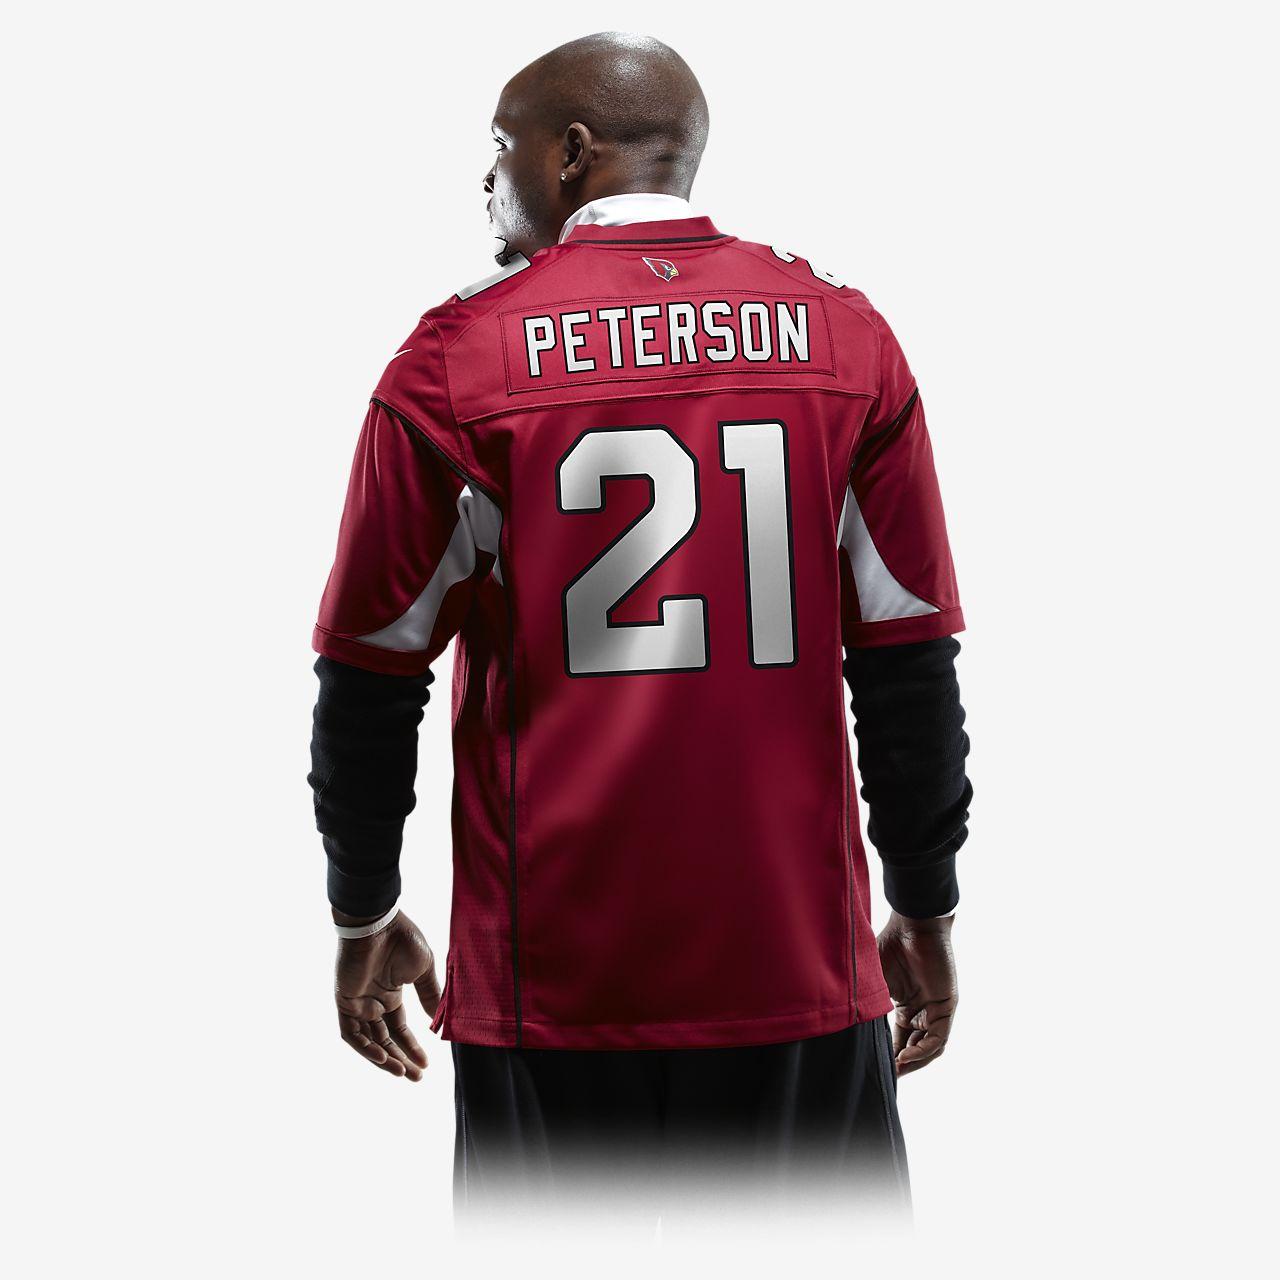 c286d76a13566 ... NFL Arizona Cardinals (Patrick Peterson) Men's American Football Home  Game Jersey